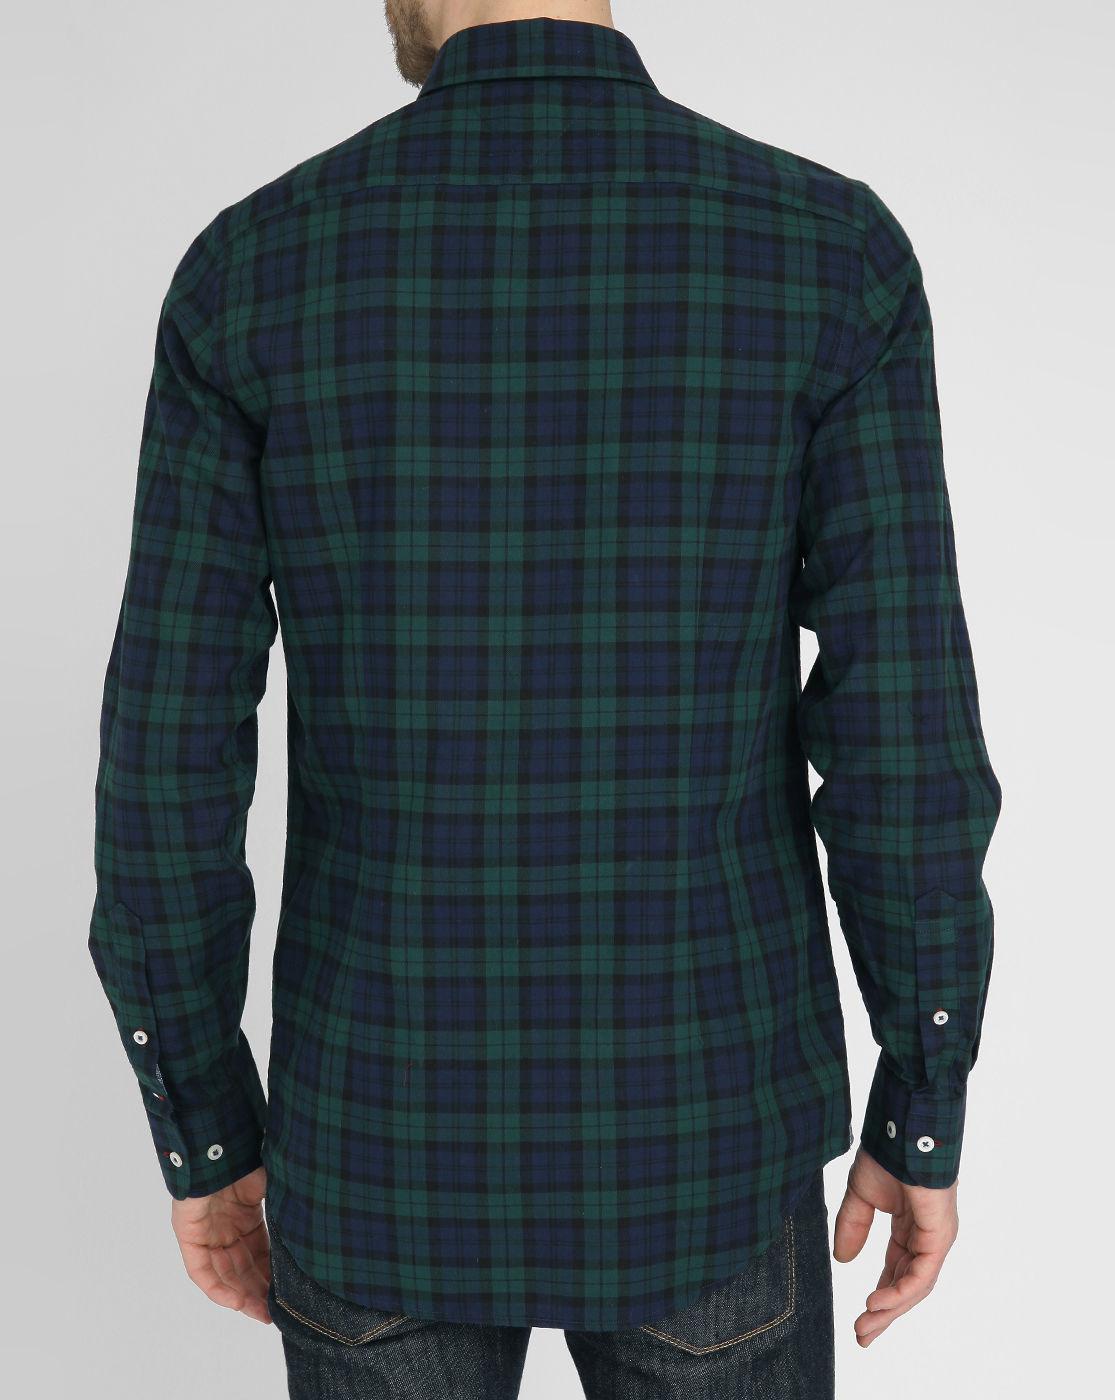 Tommy hilfiger blue and green tartan stretch cotton shirt for Blue and green tartan shirt